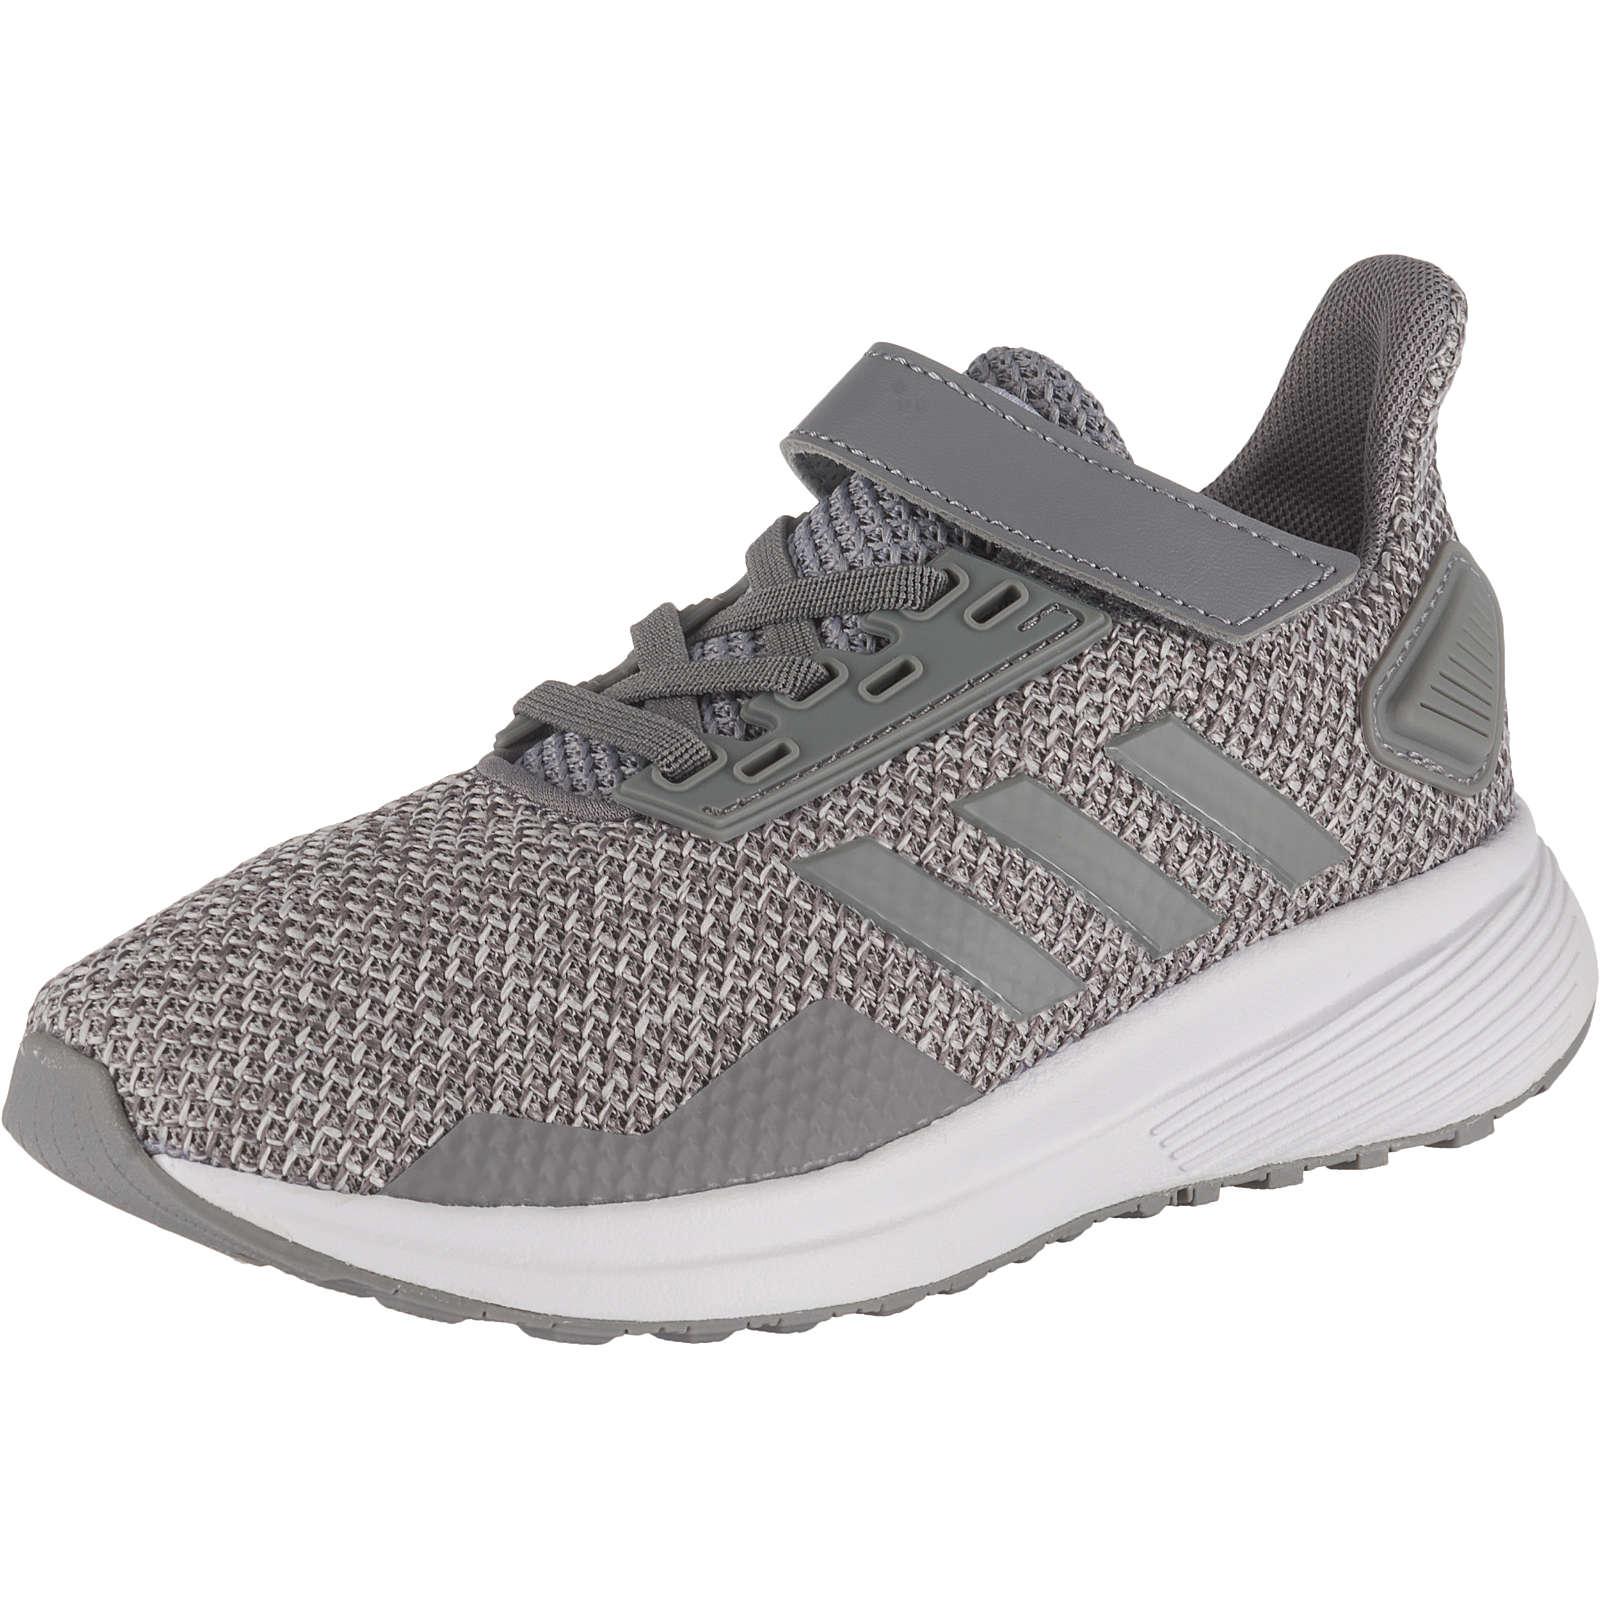 adidas Performance Kinder Sneakers DURAMO 9 C grau Gr. 32